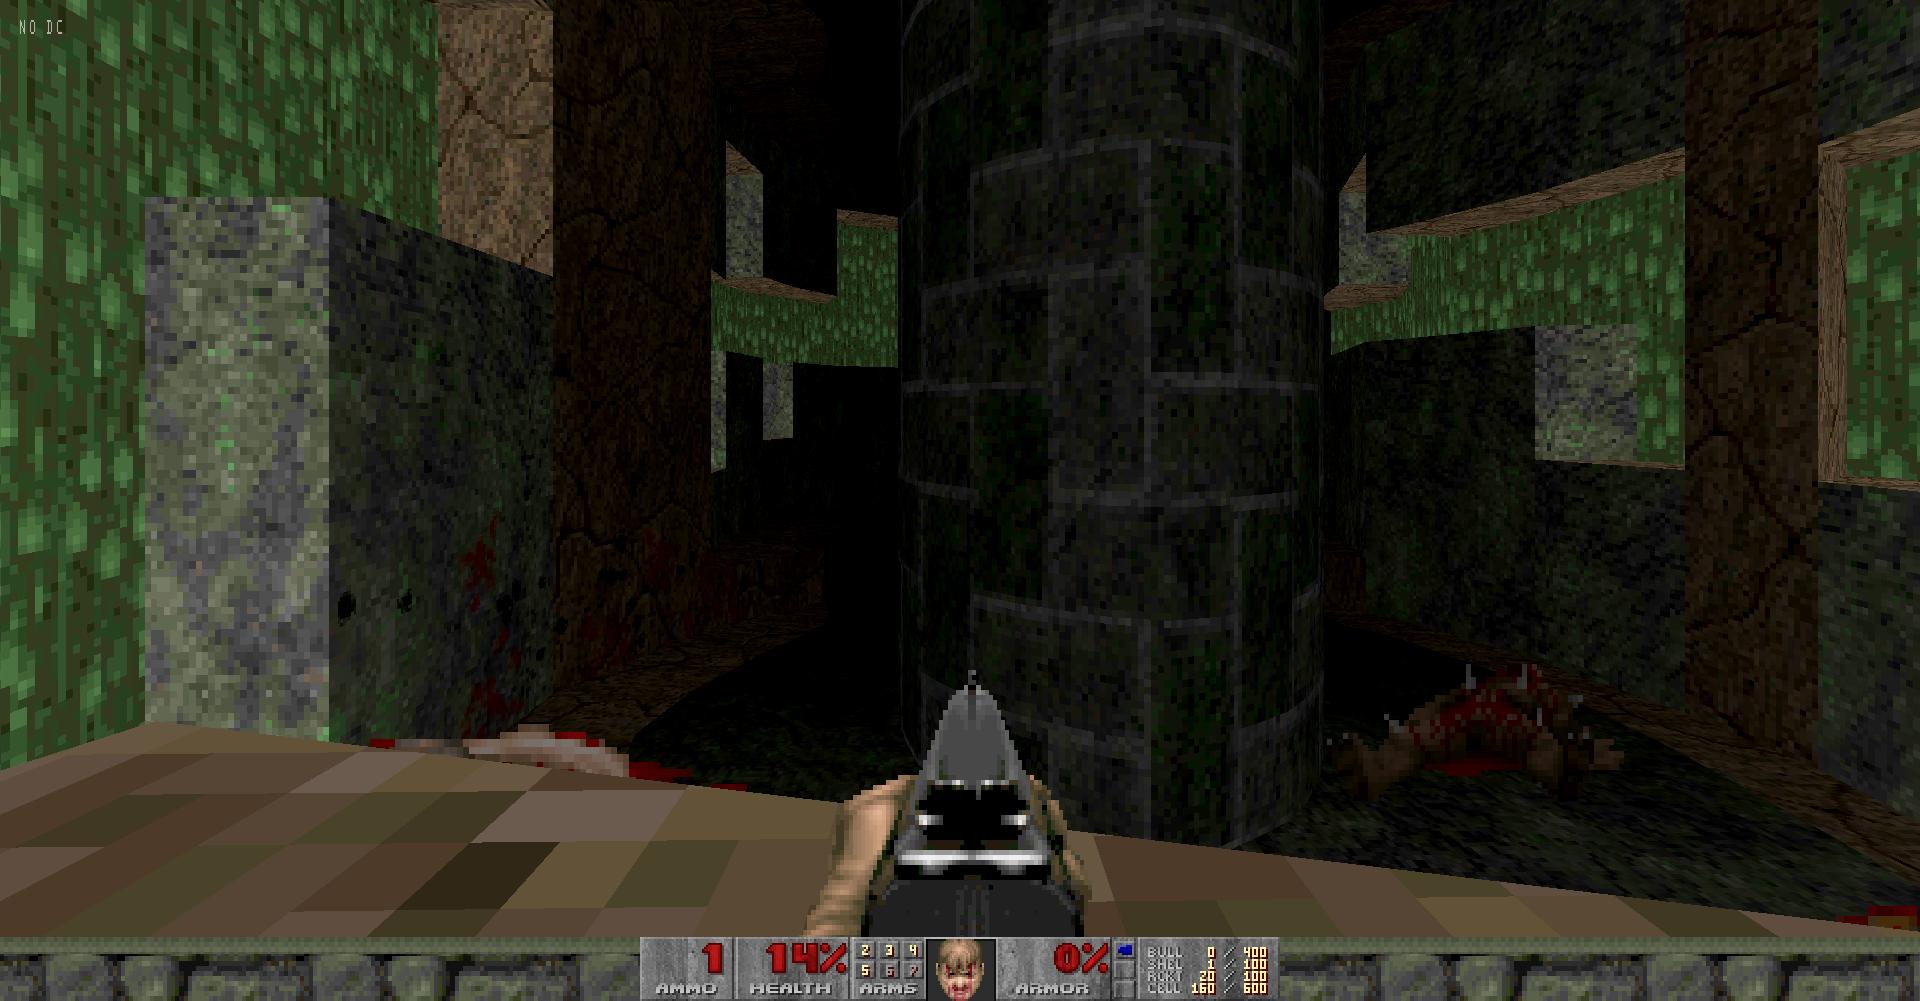 Screenshot_Doom_20210922_153055.png.83a1846e1324bba5dd80ce51ef3b66d7.png